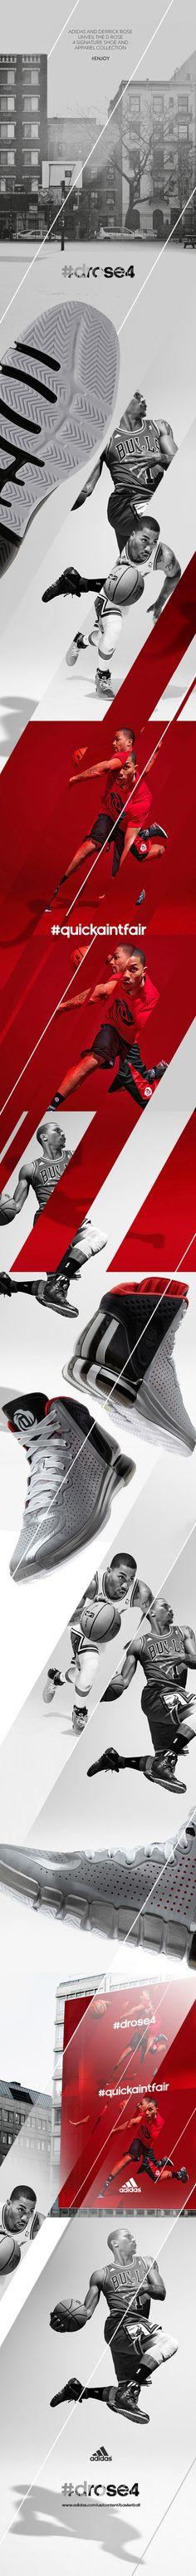 Adidas Drose4 on Behance